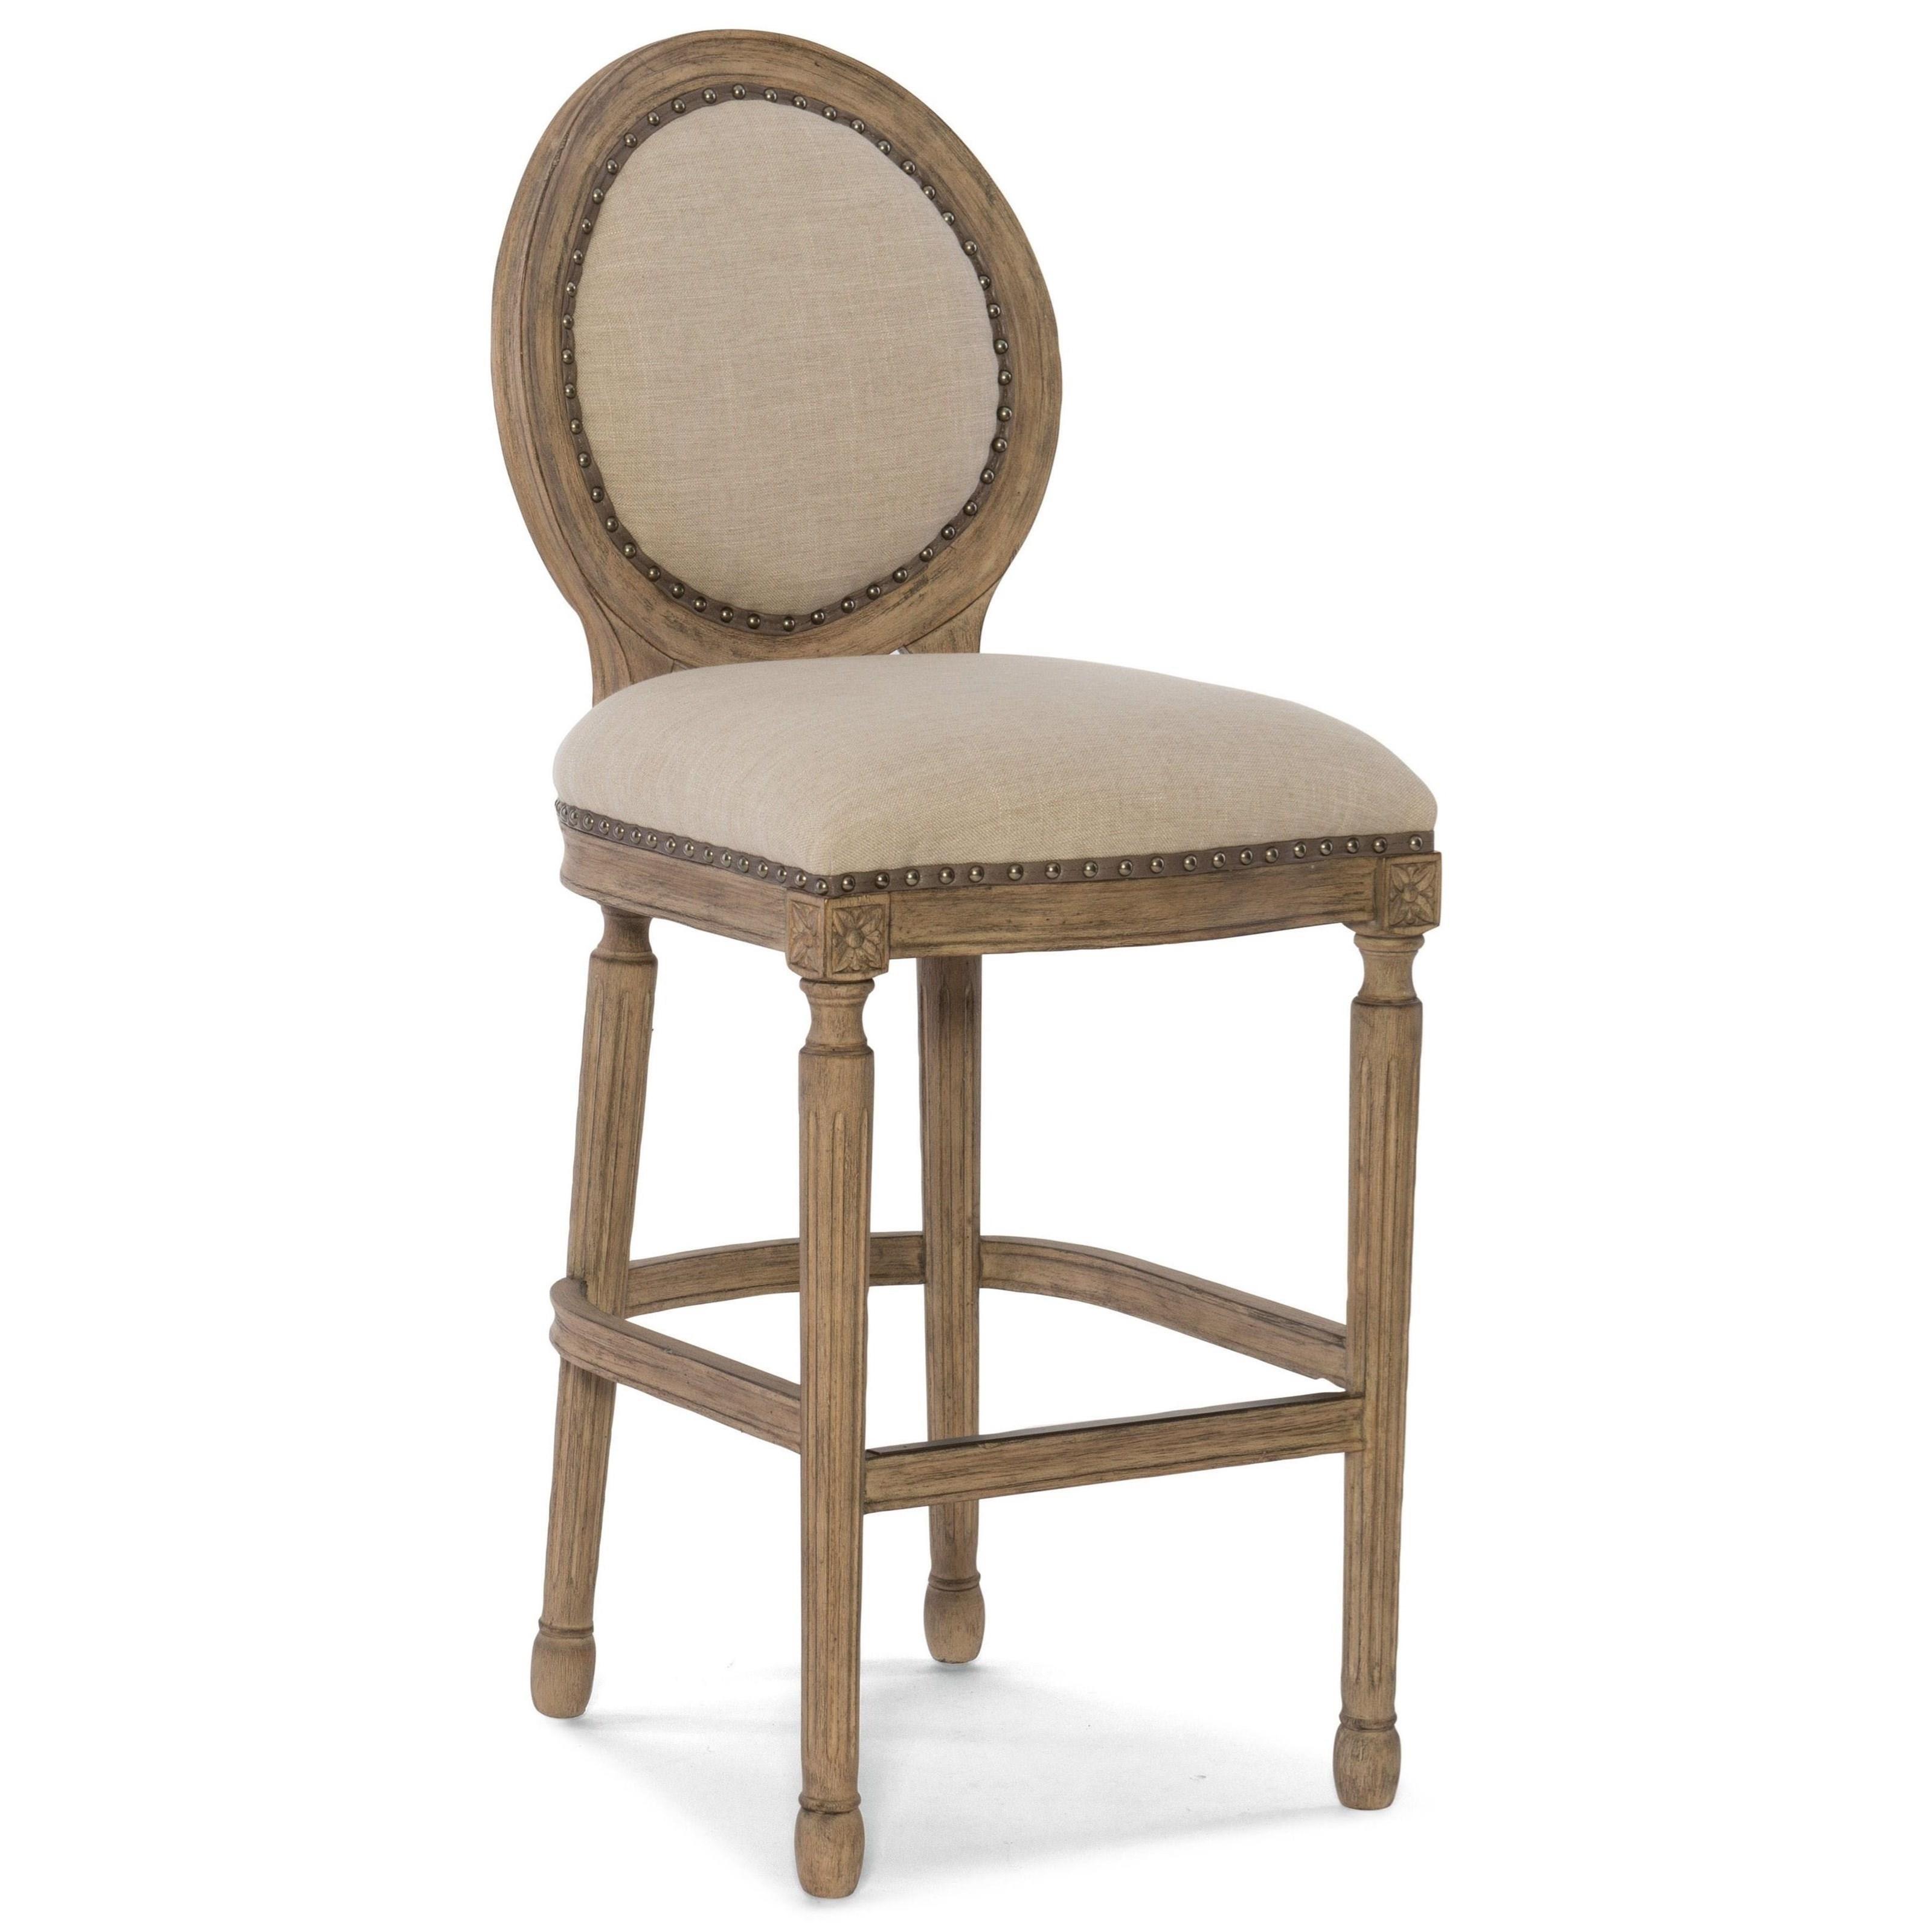 Hooker Furniture Stools Medium Lambert Counter Stool - Item Number: 300-25047